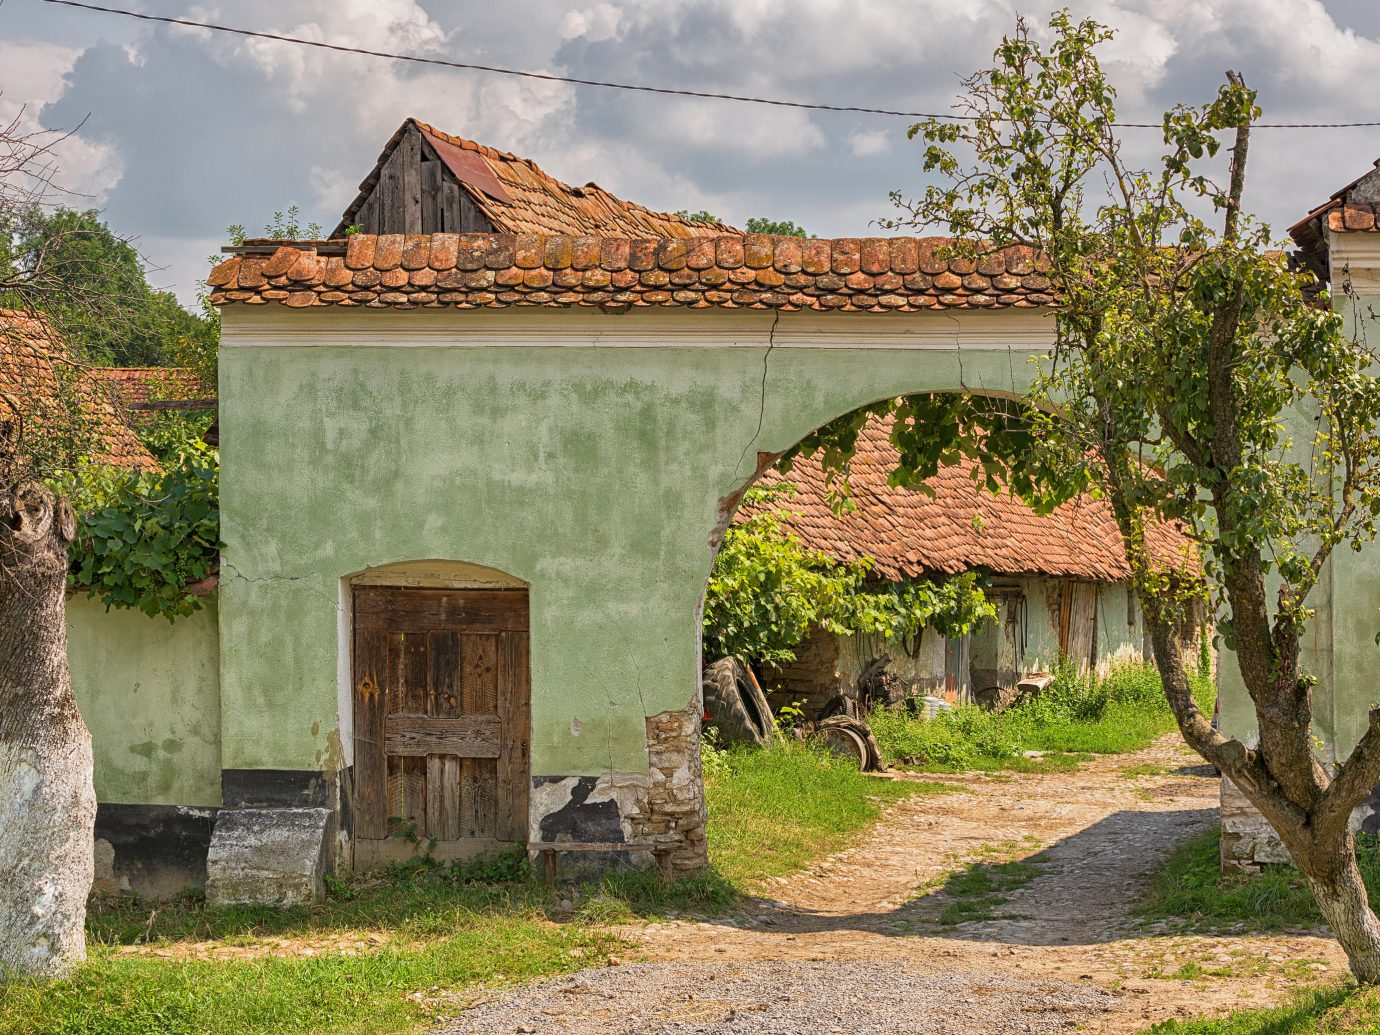 Trip Ideas outdoor grass tree house building estate rural area Village home Ruins cottage flower Garden stone